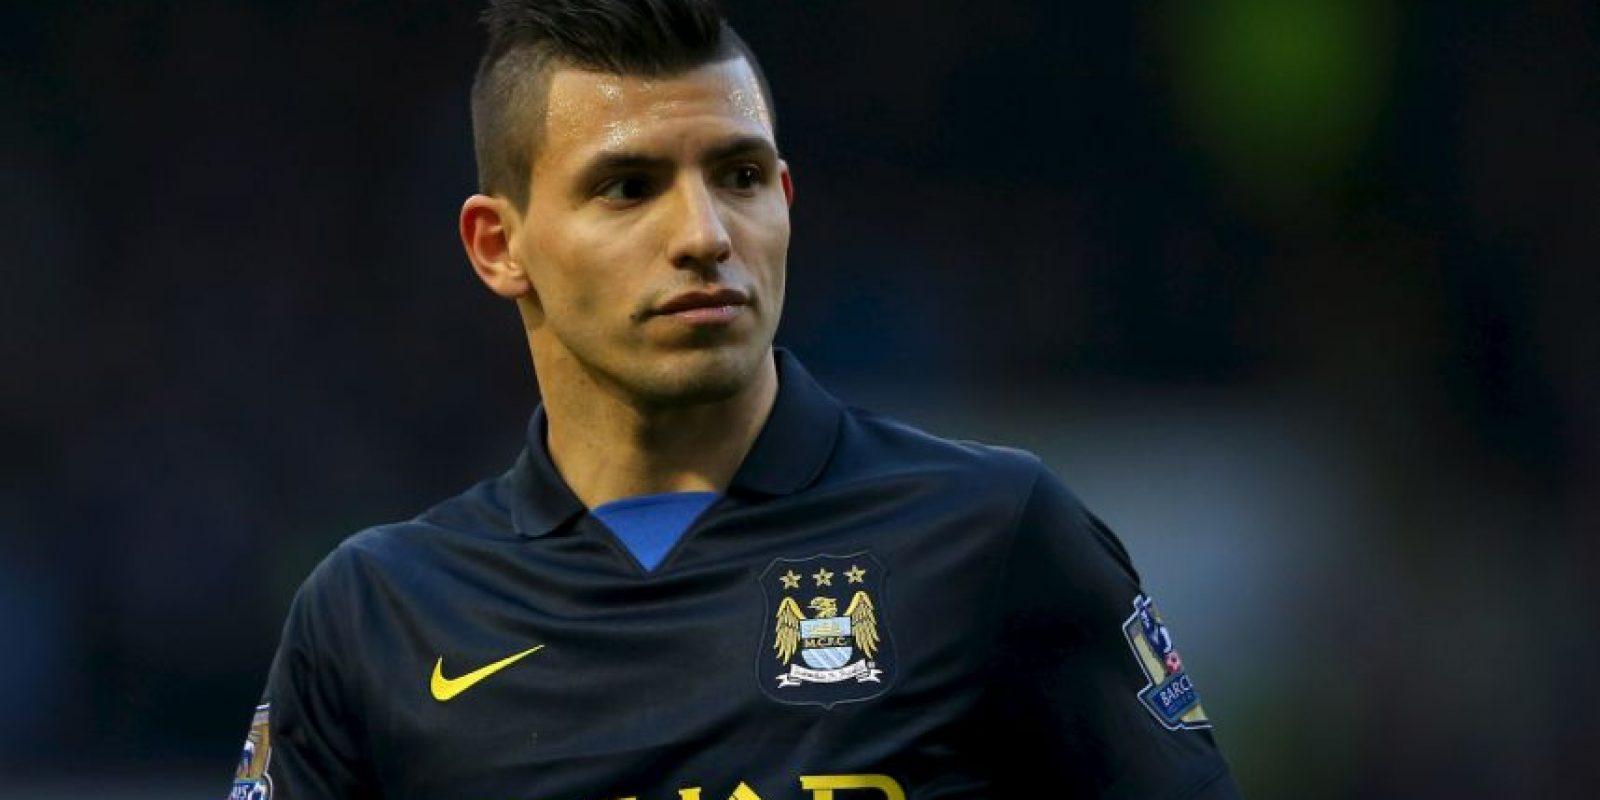 9. Sergio Aguero (Manchester City) / Ingresos: 21.2 millones de euros. Foto:Getty Images